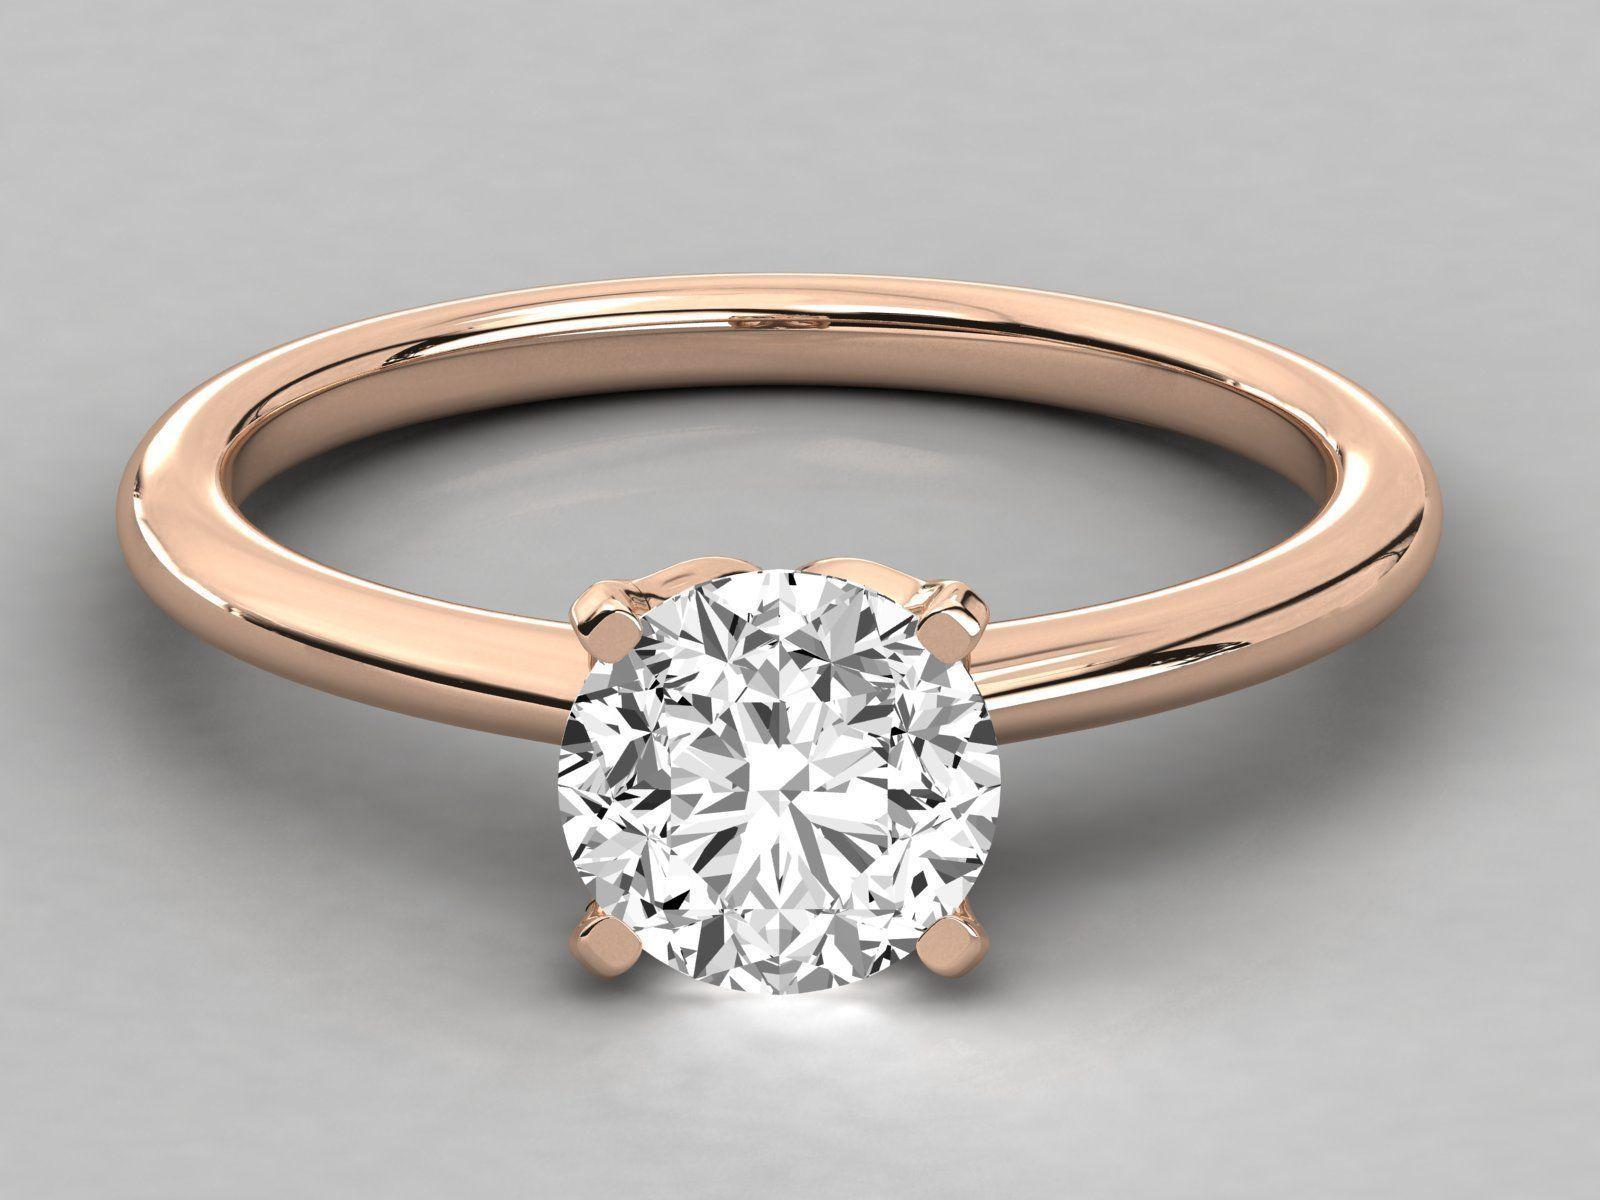 Women solitaire ring 3dm stl render detail